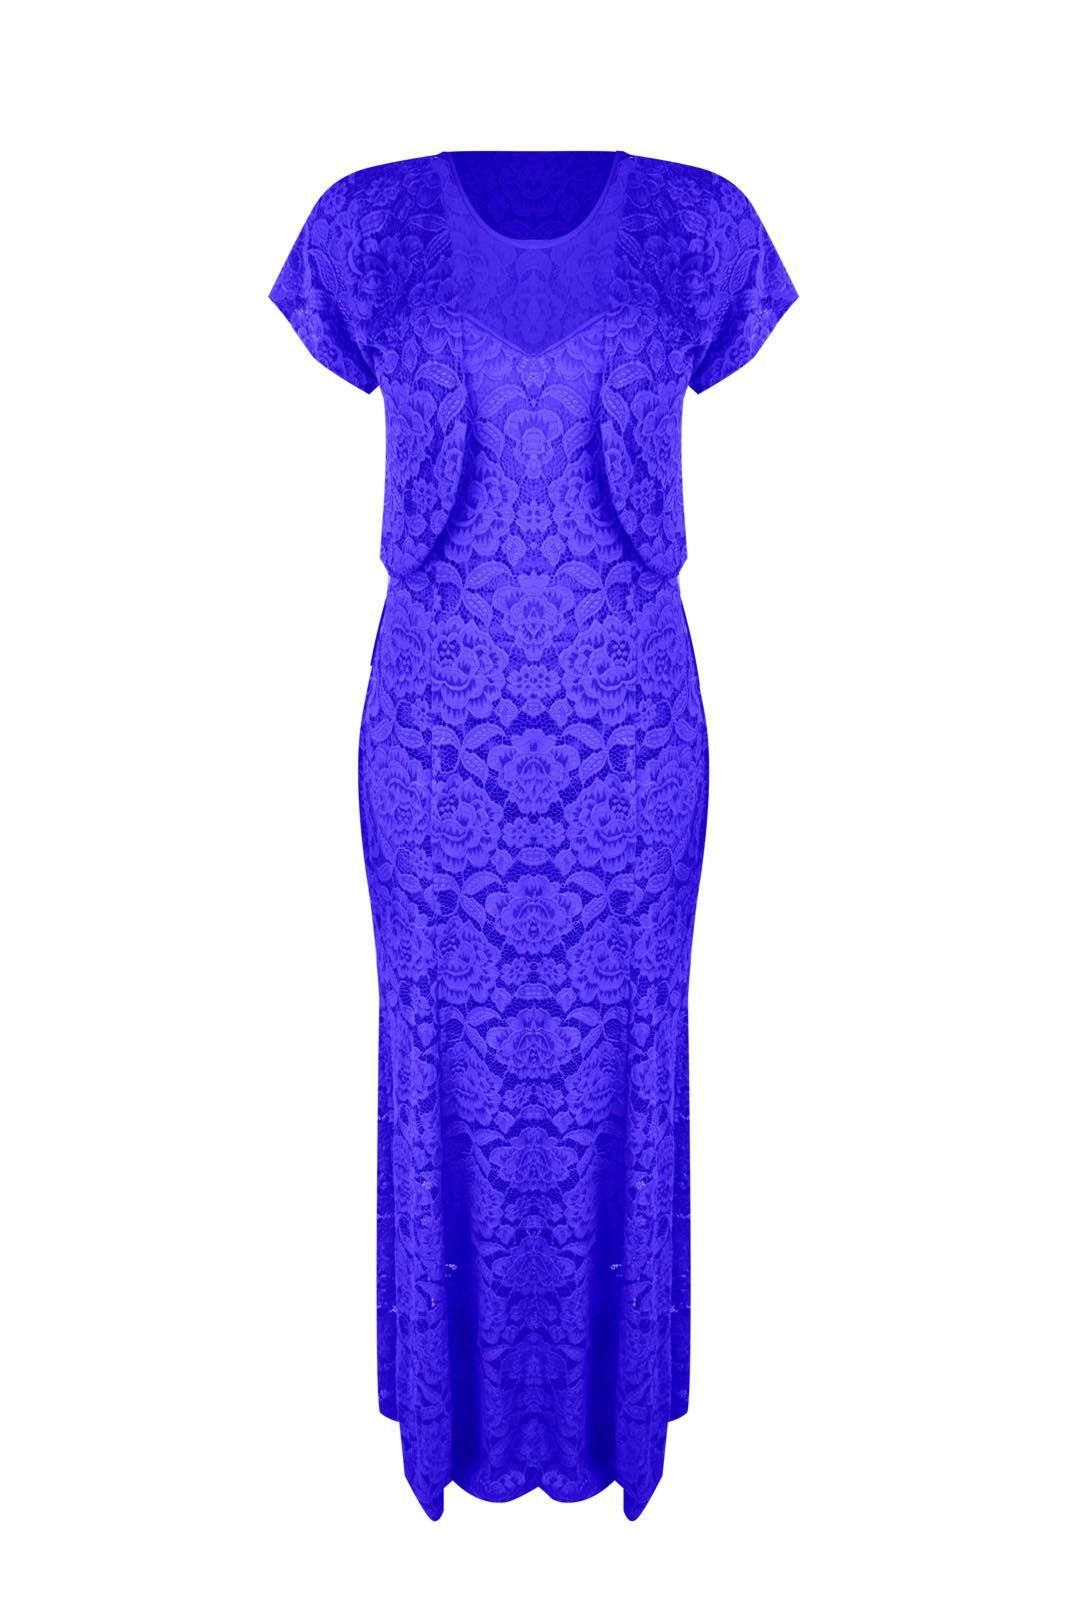 Vestido Outlet Dri Festa Casamento Formatura Sereia Conjunto Com Bolero Azul